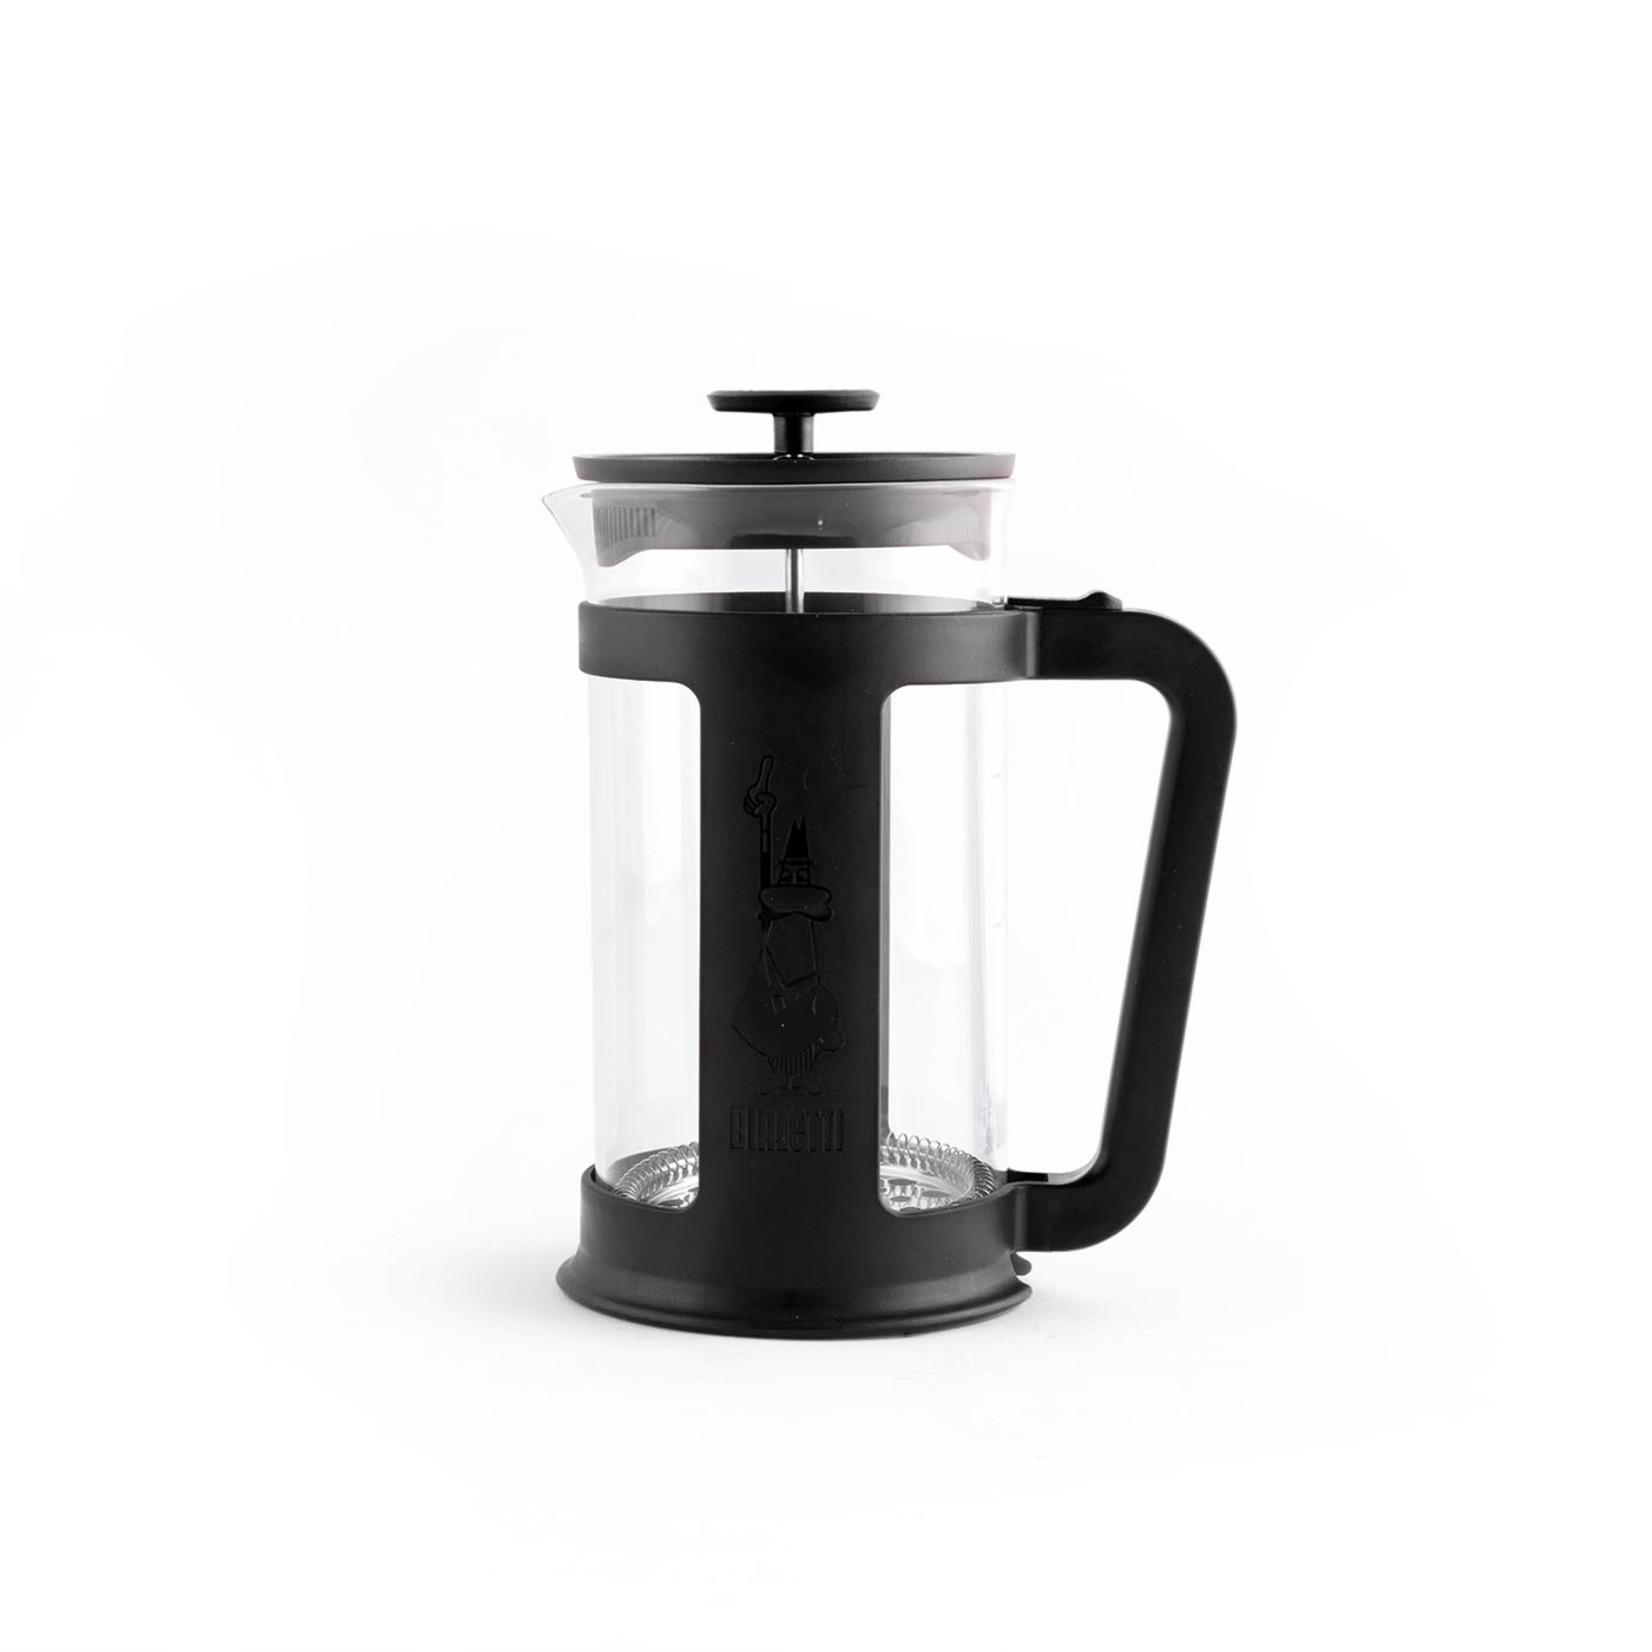 Bialetti Bialetti Caffetiere SMART zwart 1 liter